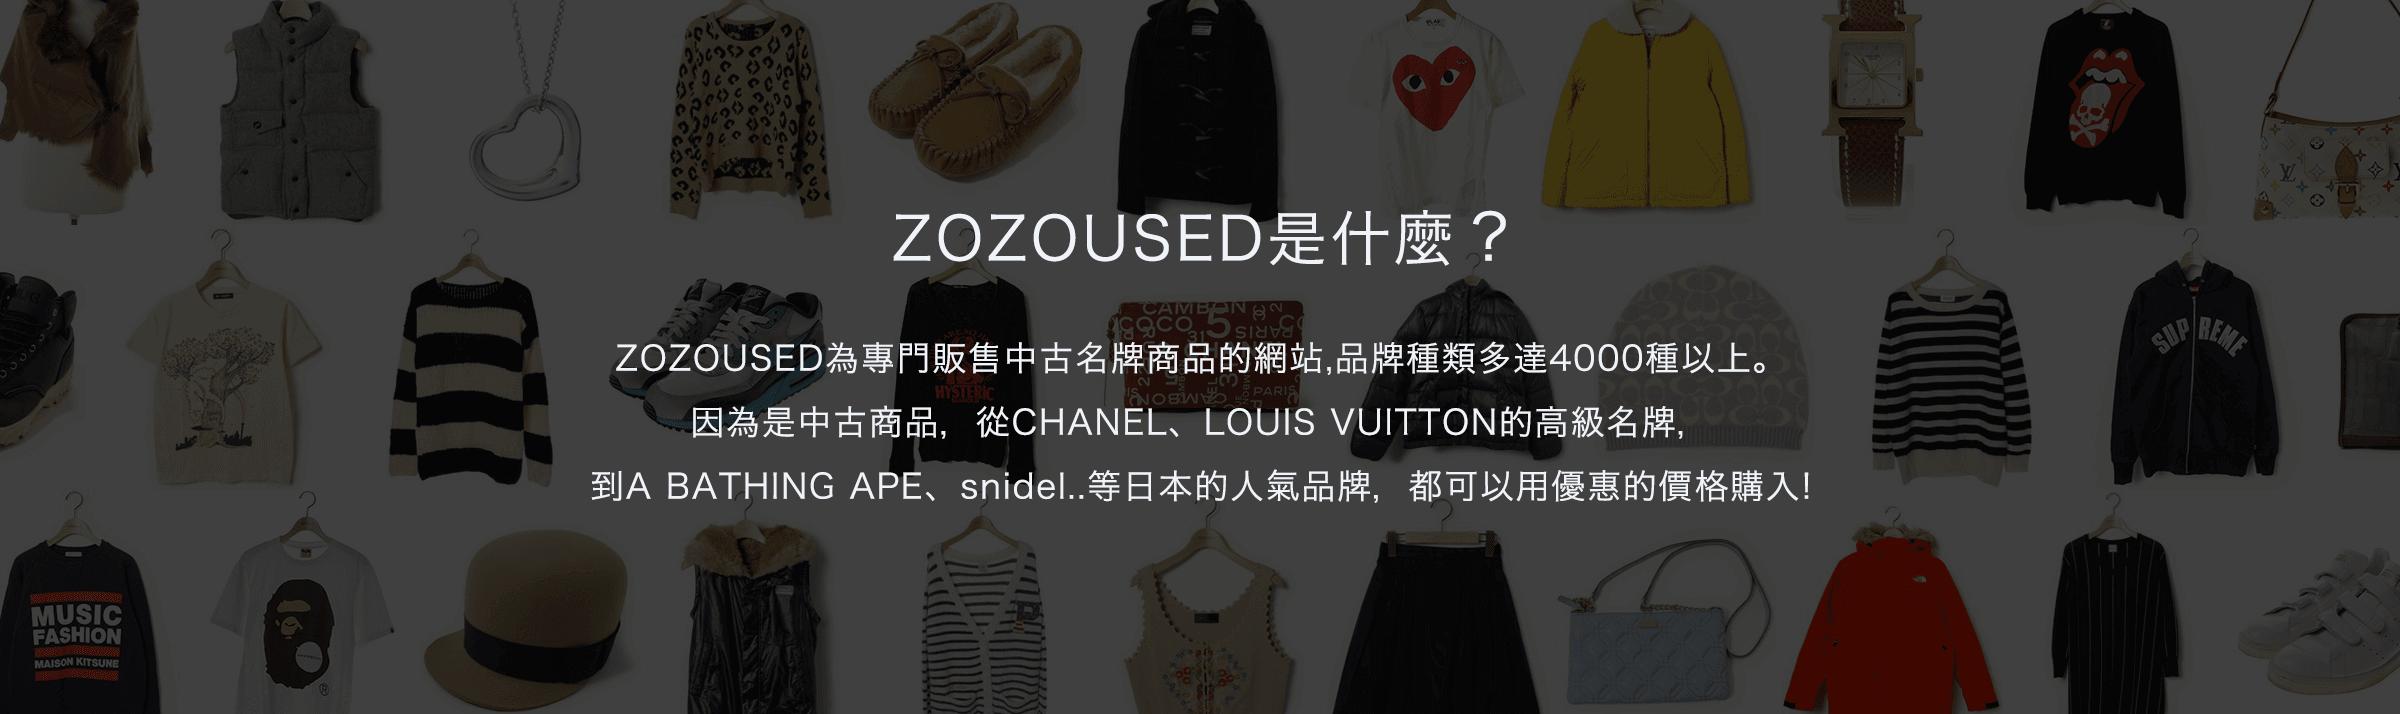 ZOZOUSED為專門販售中古名牌商品的網站,品牌種類多達4000種以上。因為是中古商品,從CHANEL、LOUIS VUITTON的高級名牌,到A BATHING APE、snidel..等日本的人氣品牌,都可以用優惠的價格購入!